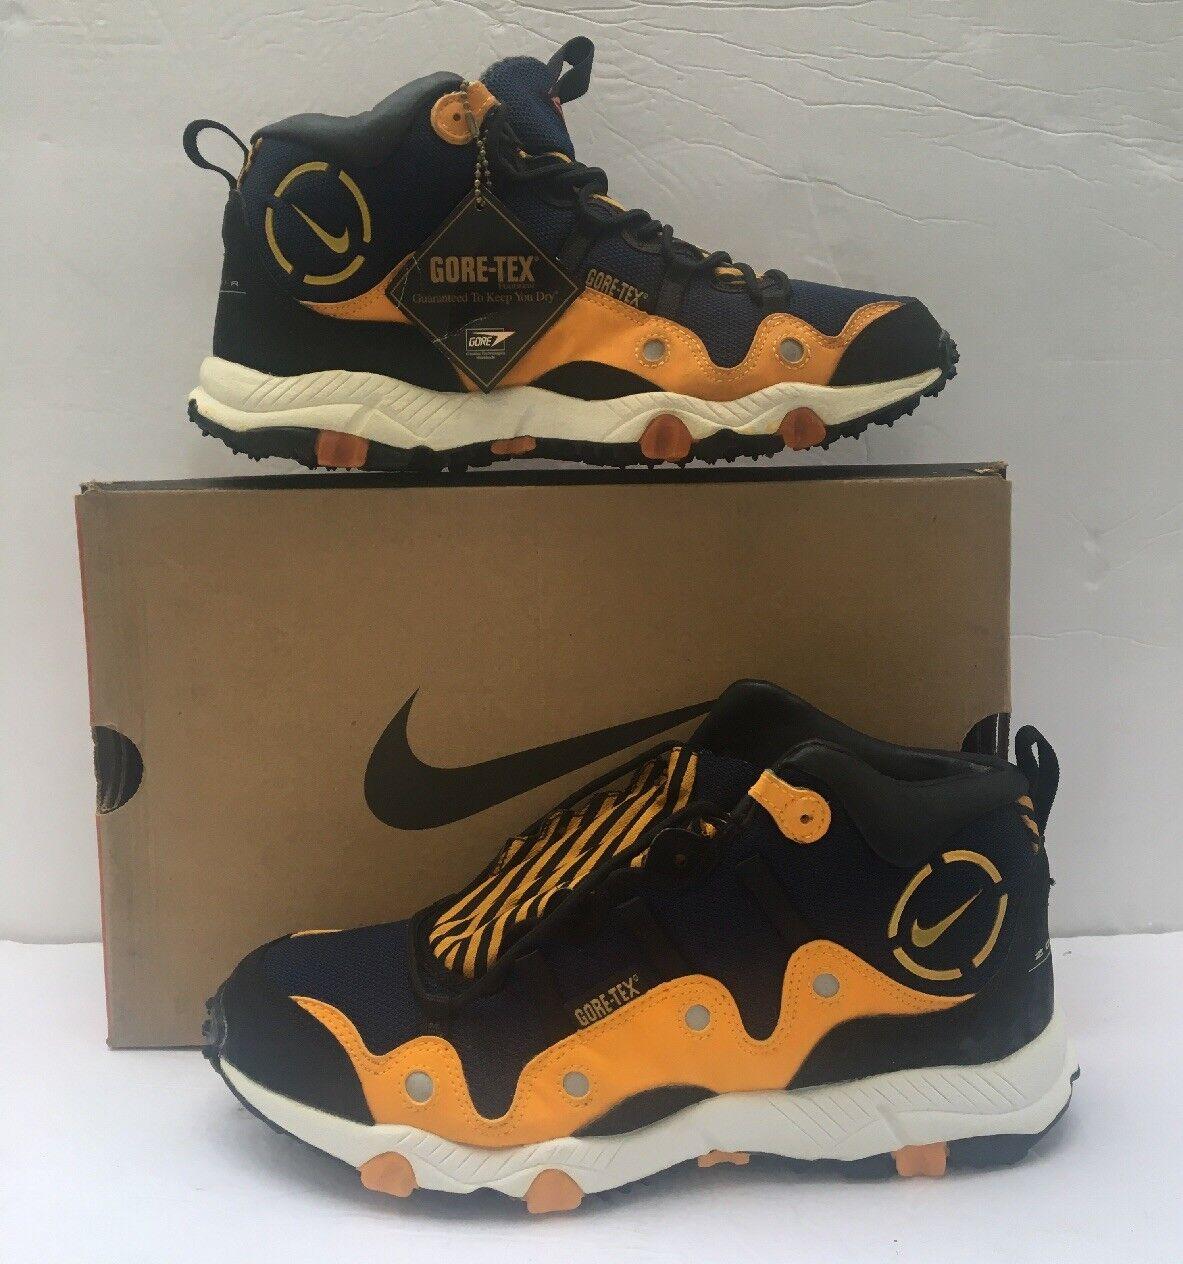 Vintae Nike Air Minot 104100-471 Gore-tex Hiking Sneaker Navy/yellow/black 104100-471 Minot 8.5 b7cc0e